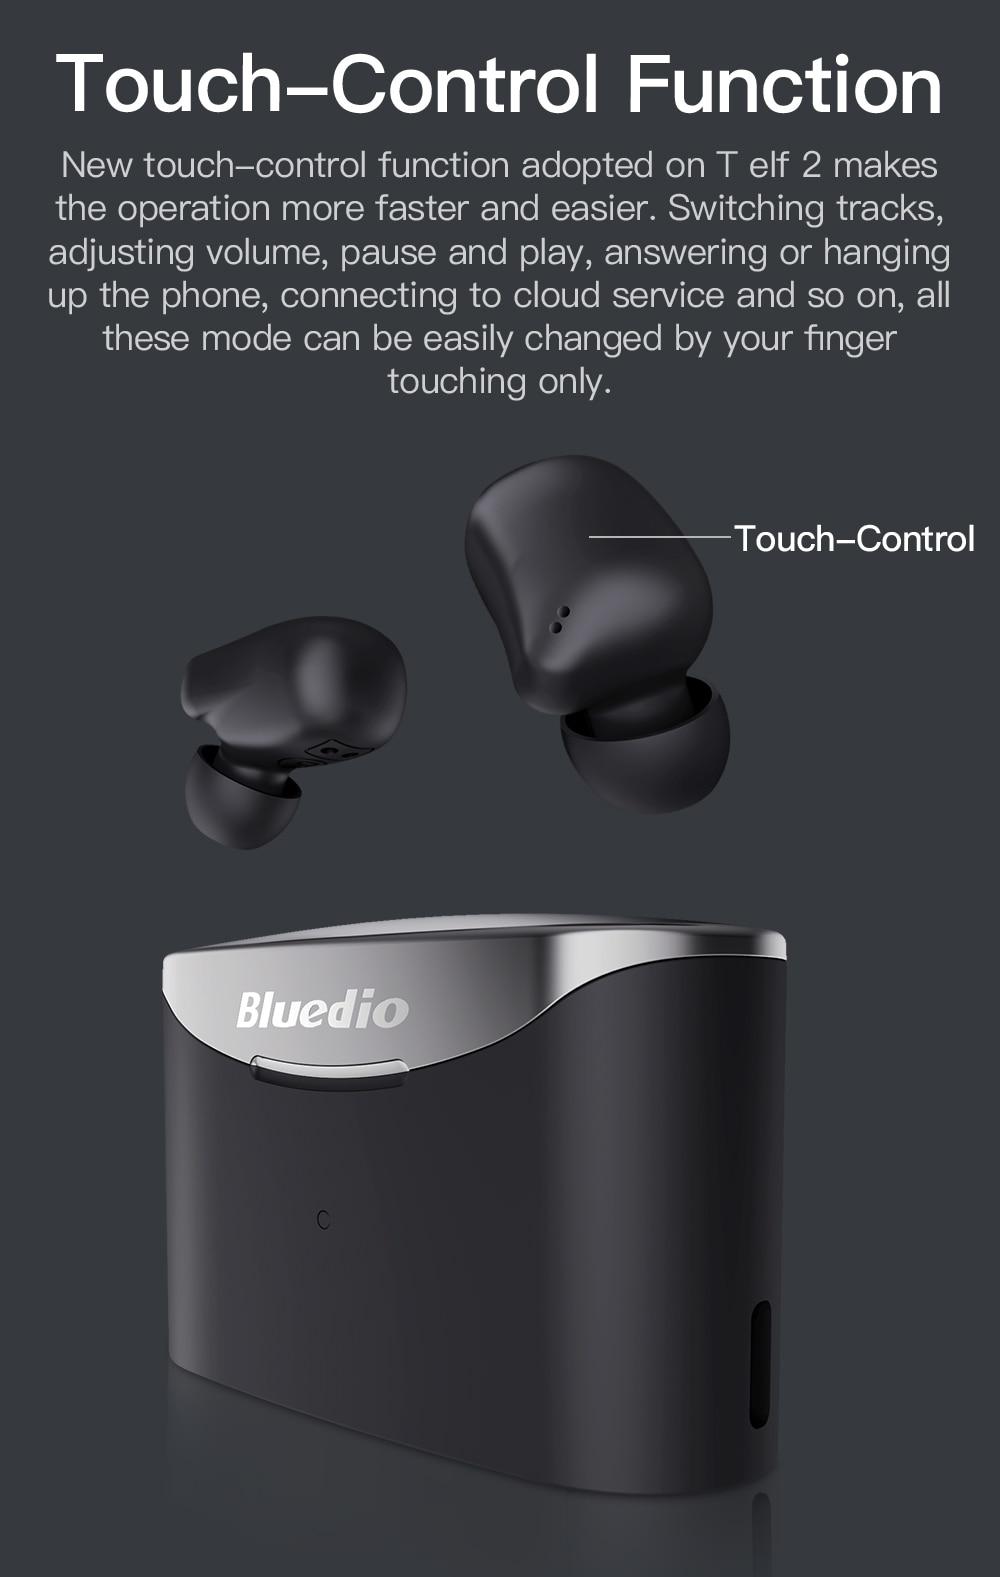 Bluedio T-elf 2 Earbuds Best Price in Pakistan www.brandtech.pk 4